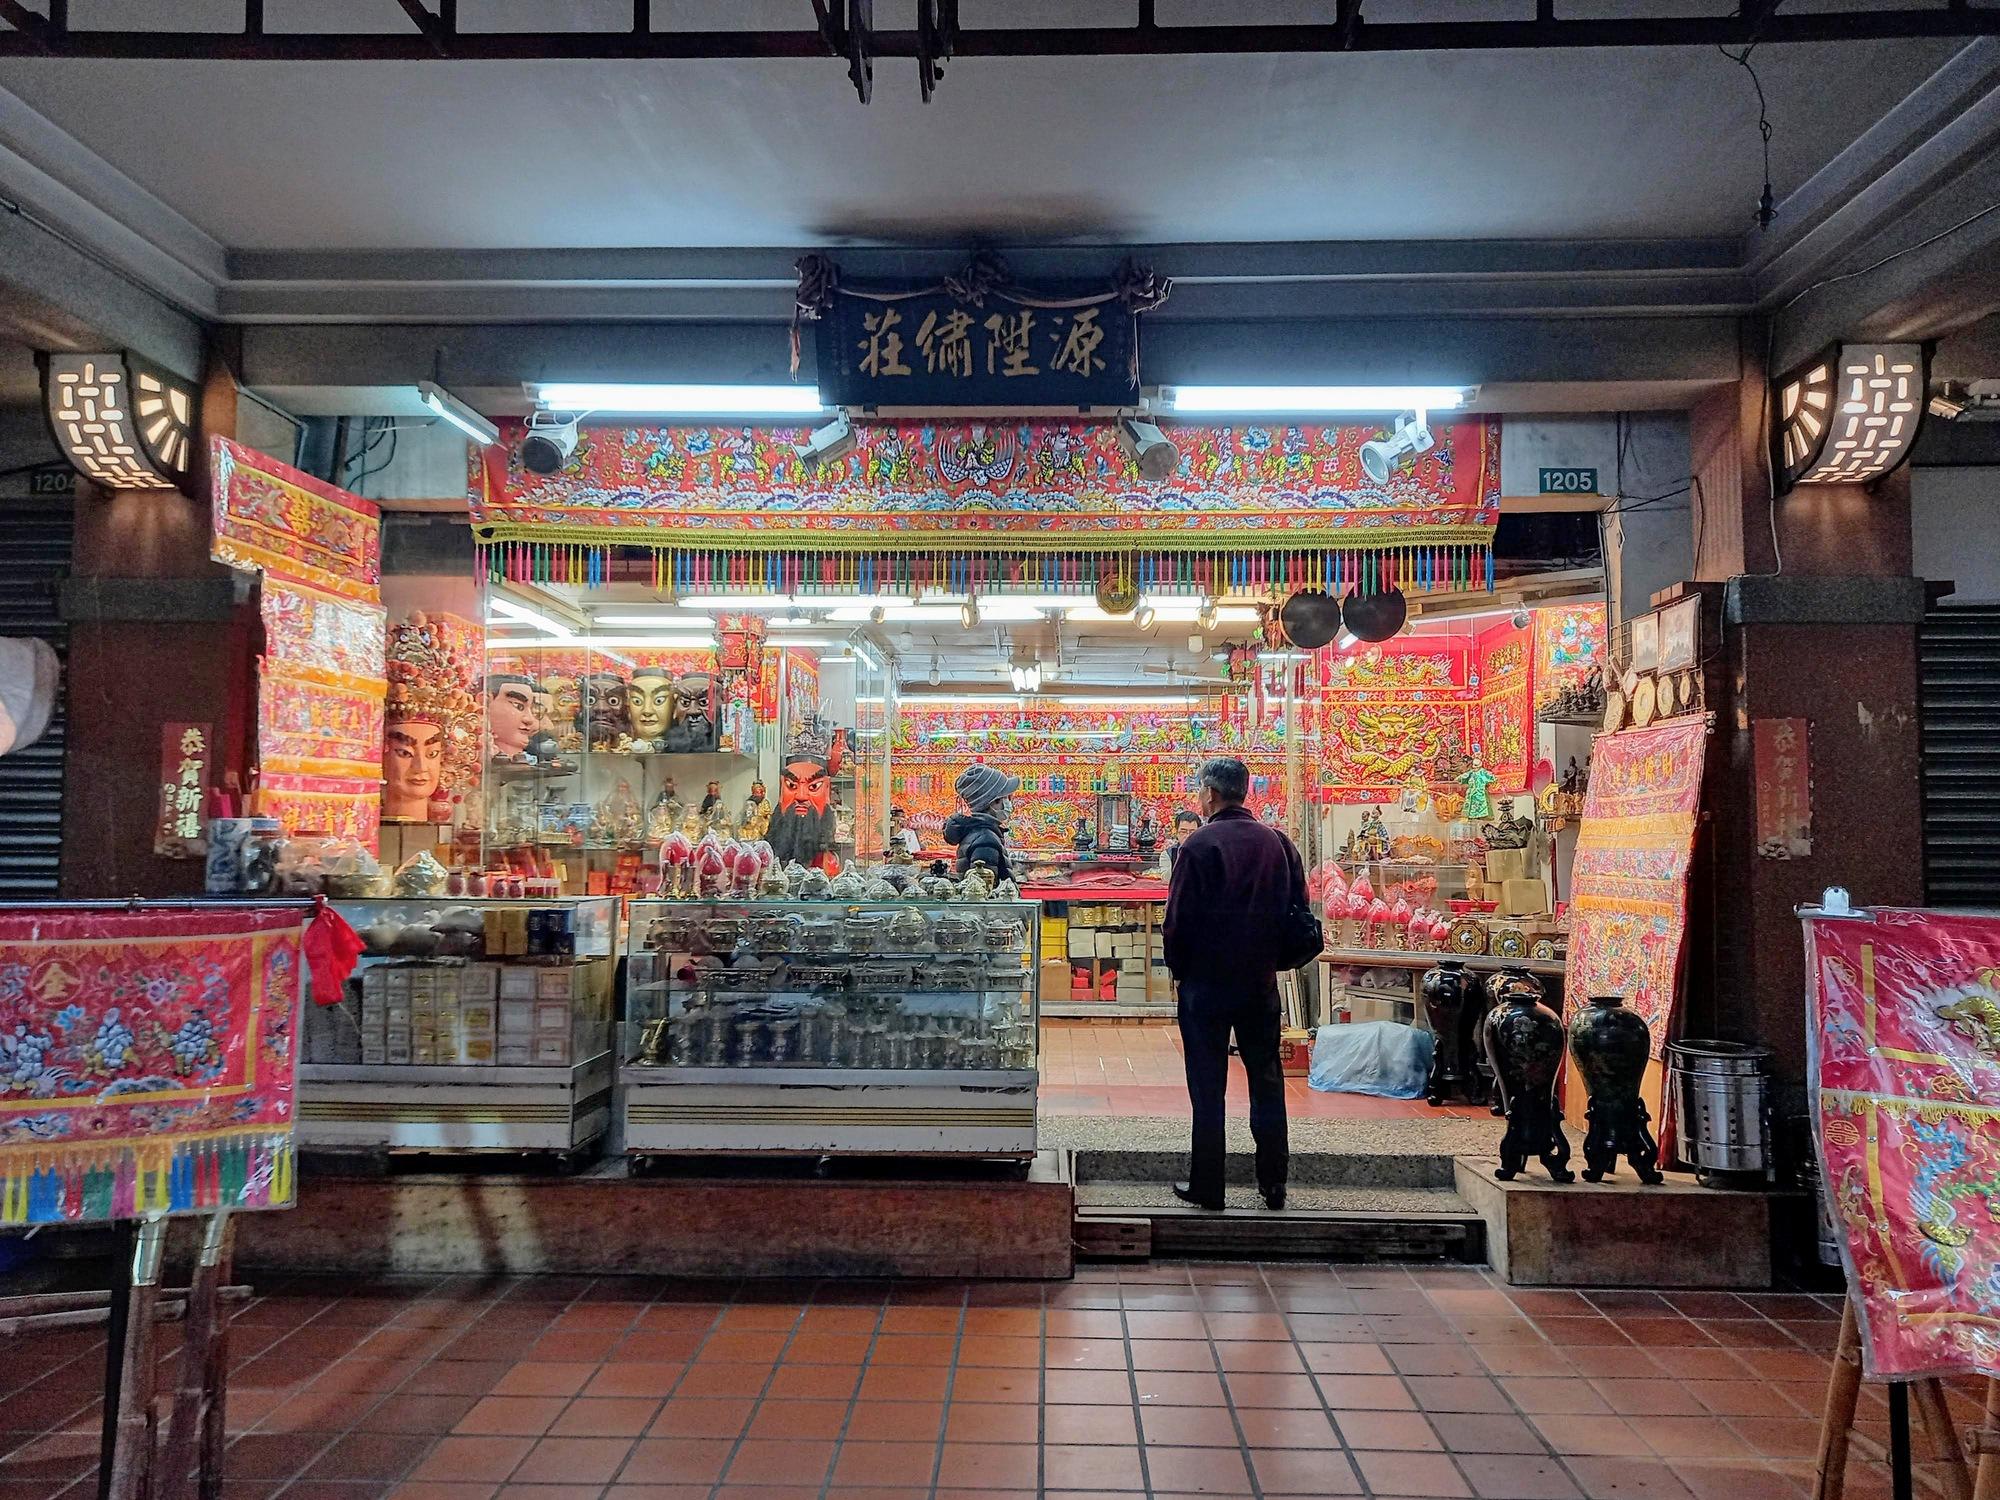 Shopfronts at Dihua St., Dadaocheng 大稻埕